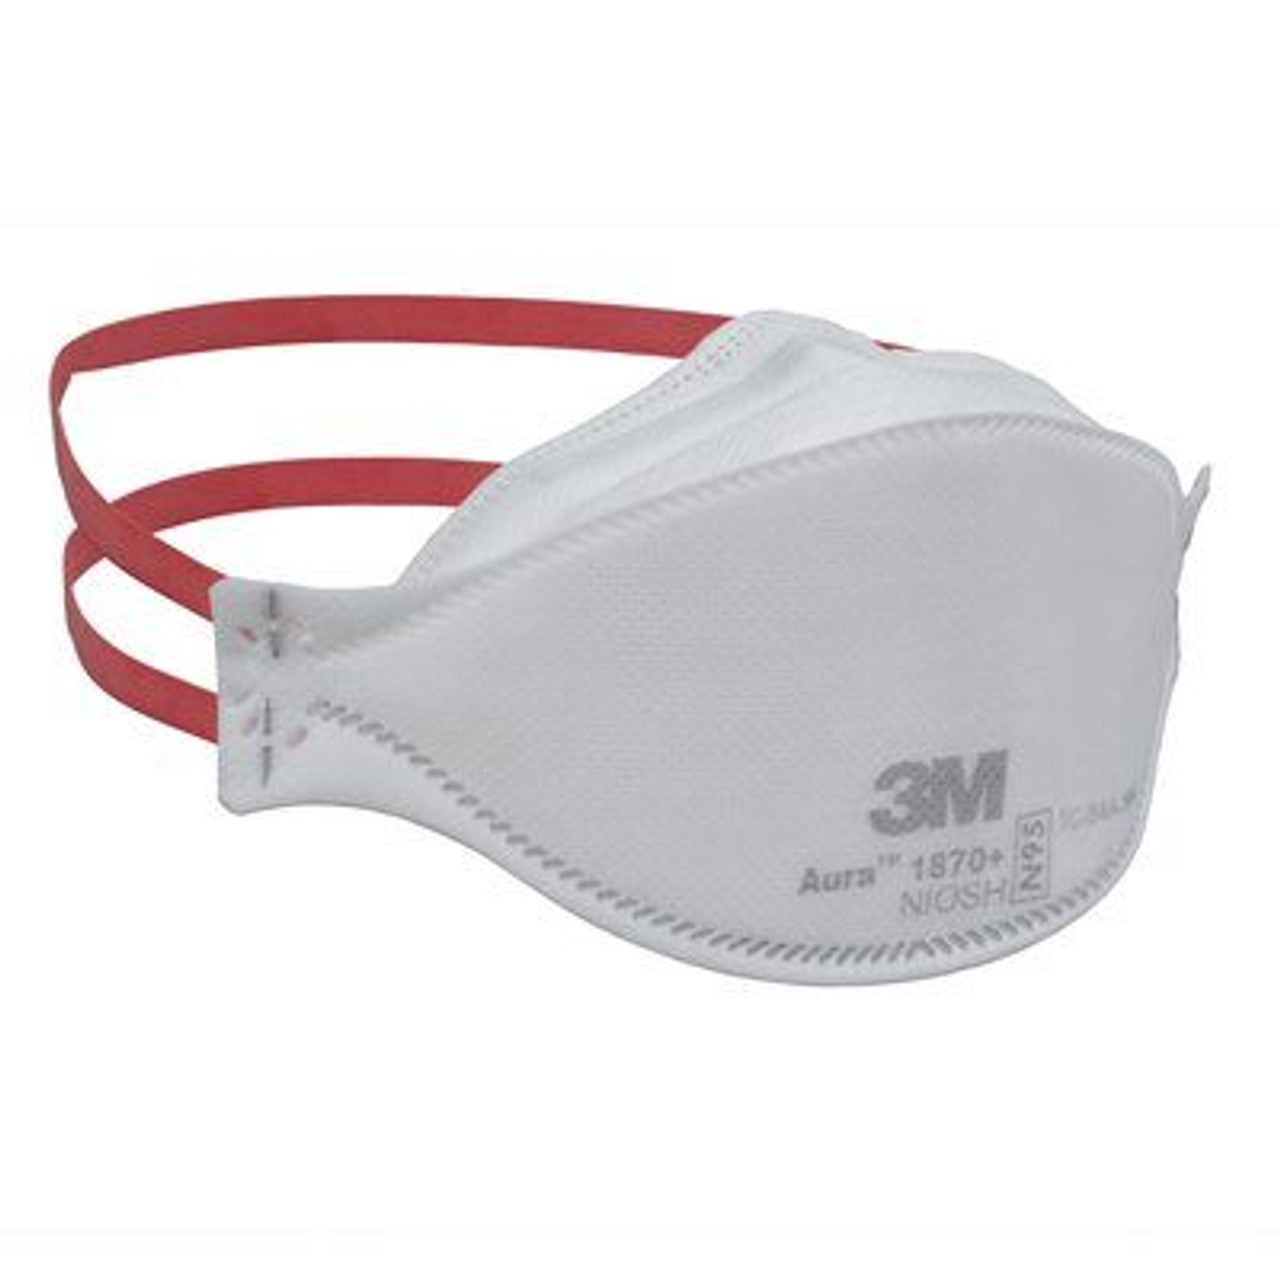 3m N95 Gt500073009 1870 6 20 Of Surgical Packs total Care Health Mask amp; Respirator Masks Masks Particulate 120 Aura